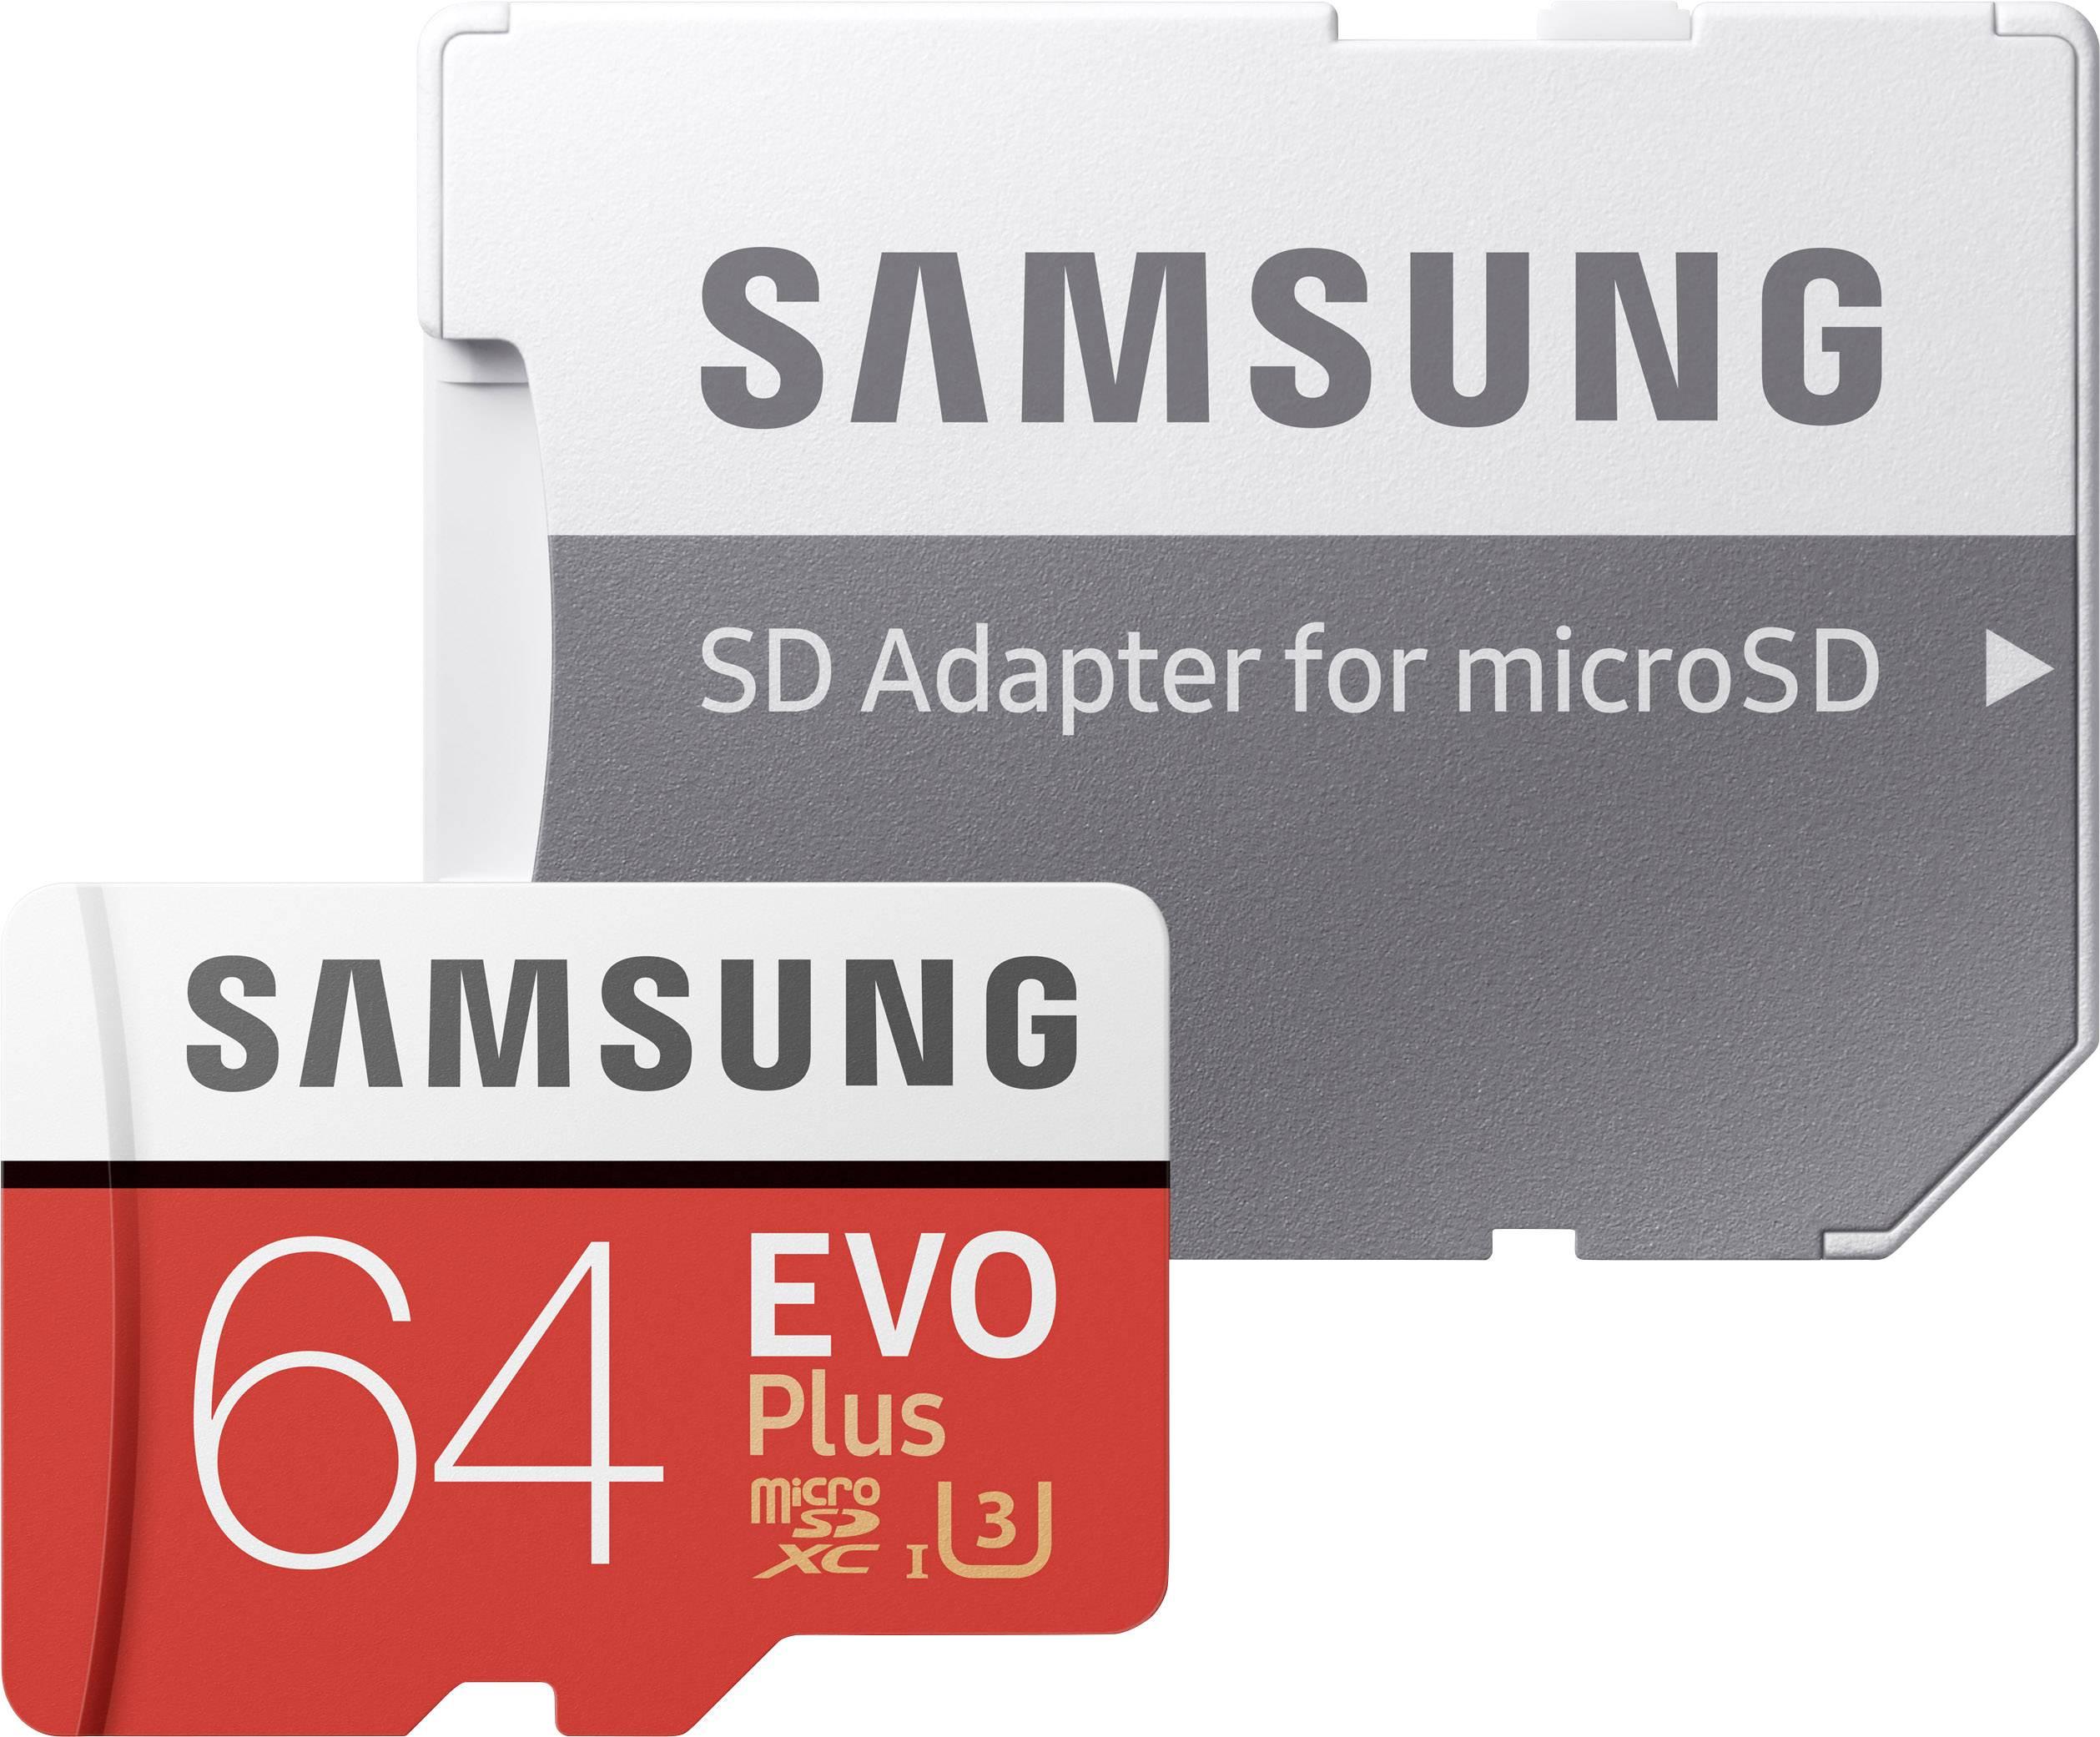 Microsd Karten Gnstig Online Kaufen Bei Conrad Sandisk Ultra Micro Sd Sdhc 16gb Speed 80mb S Class 10 Uhs 1 16 Gb Samsung Evo Plus Microsdxc Karte 64 I